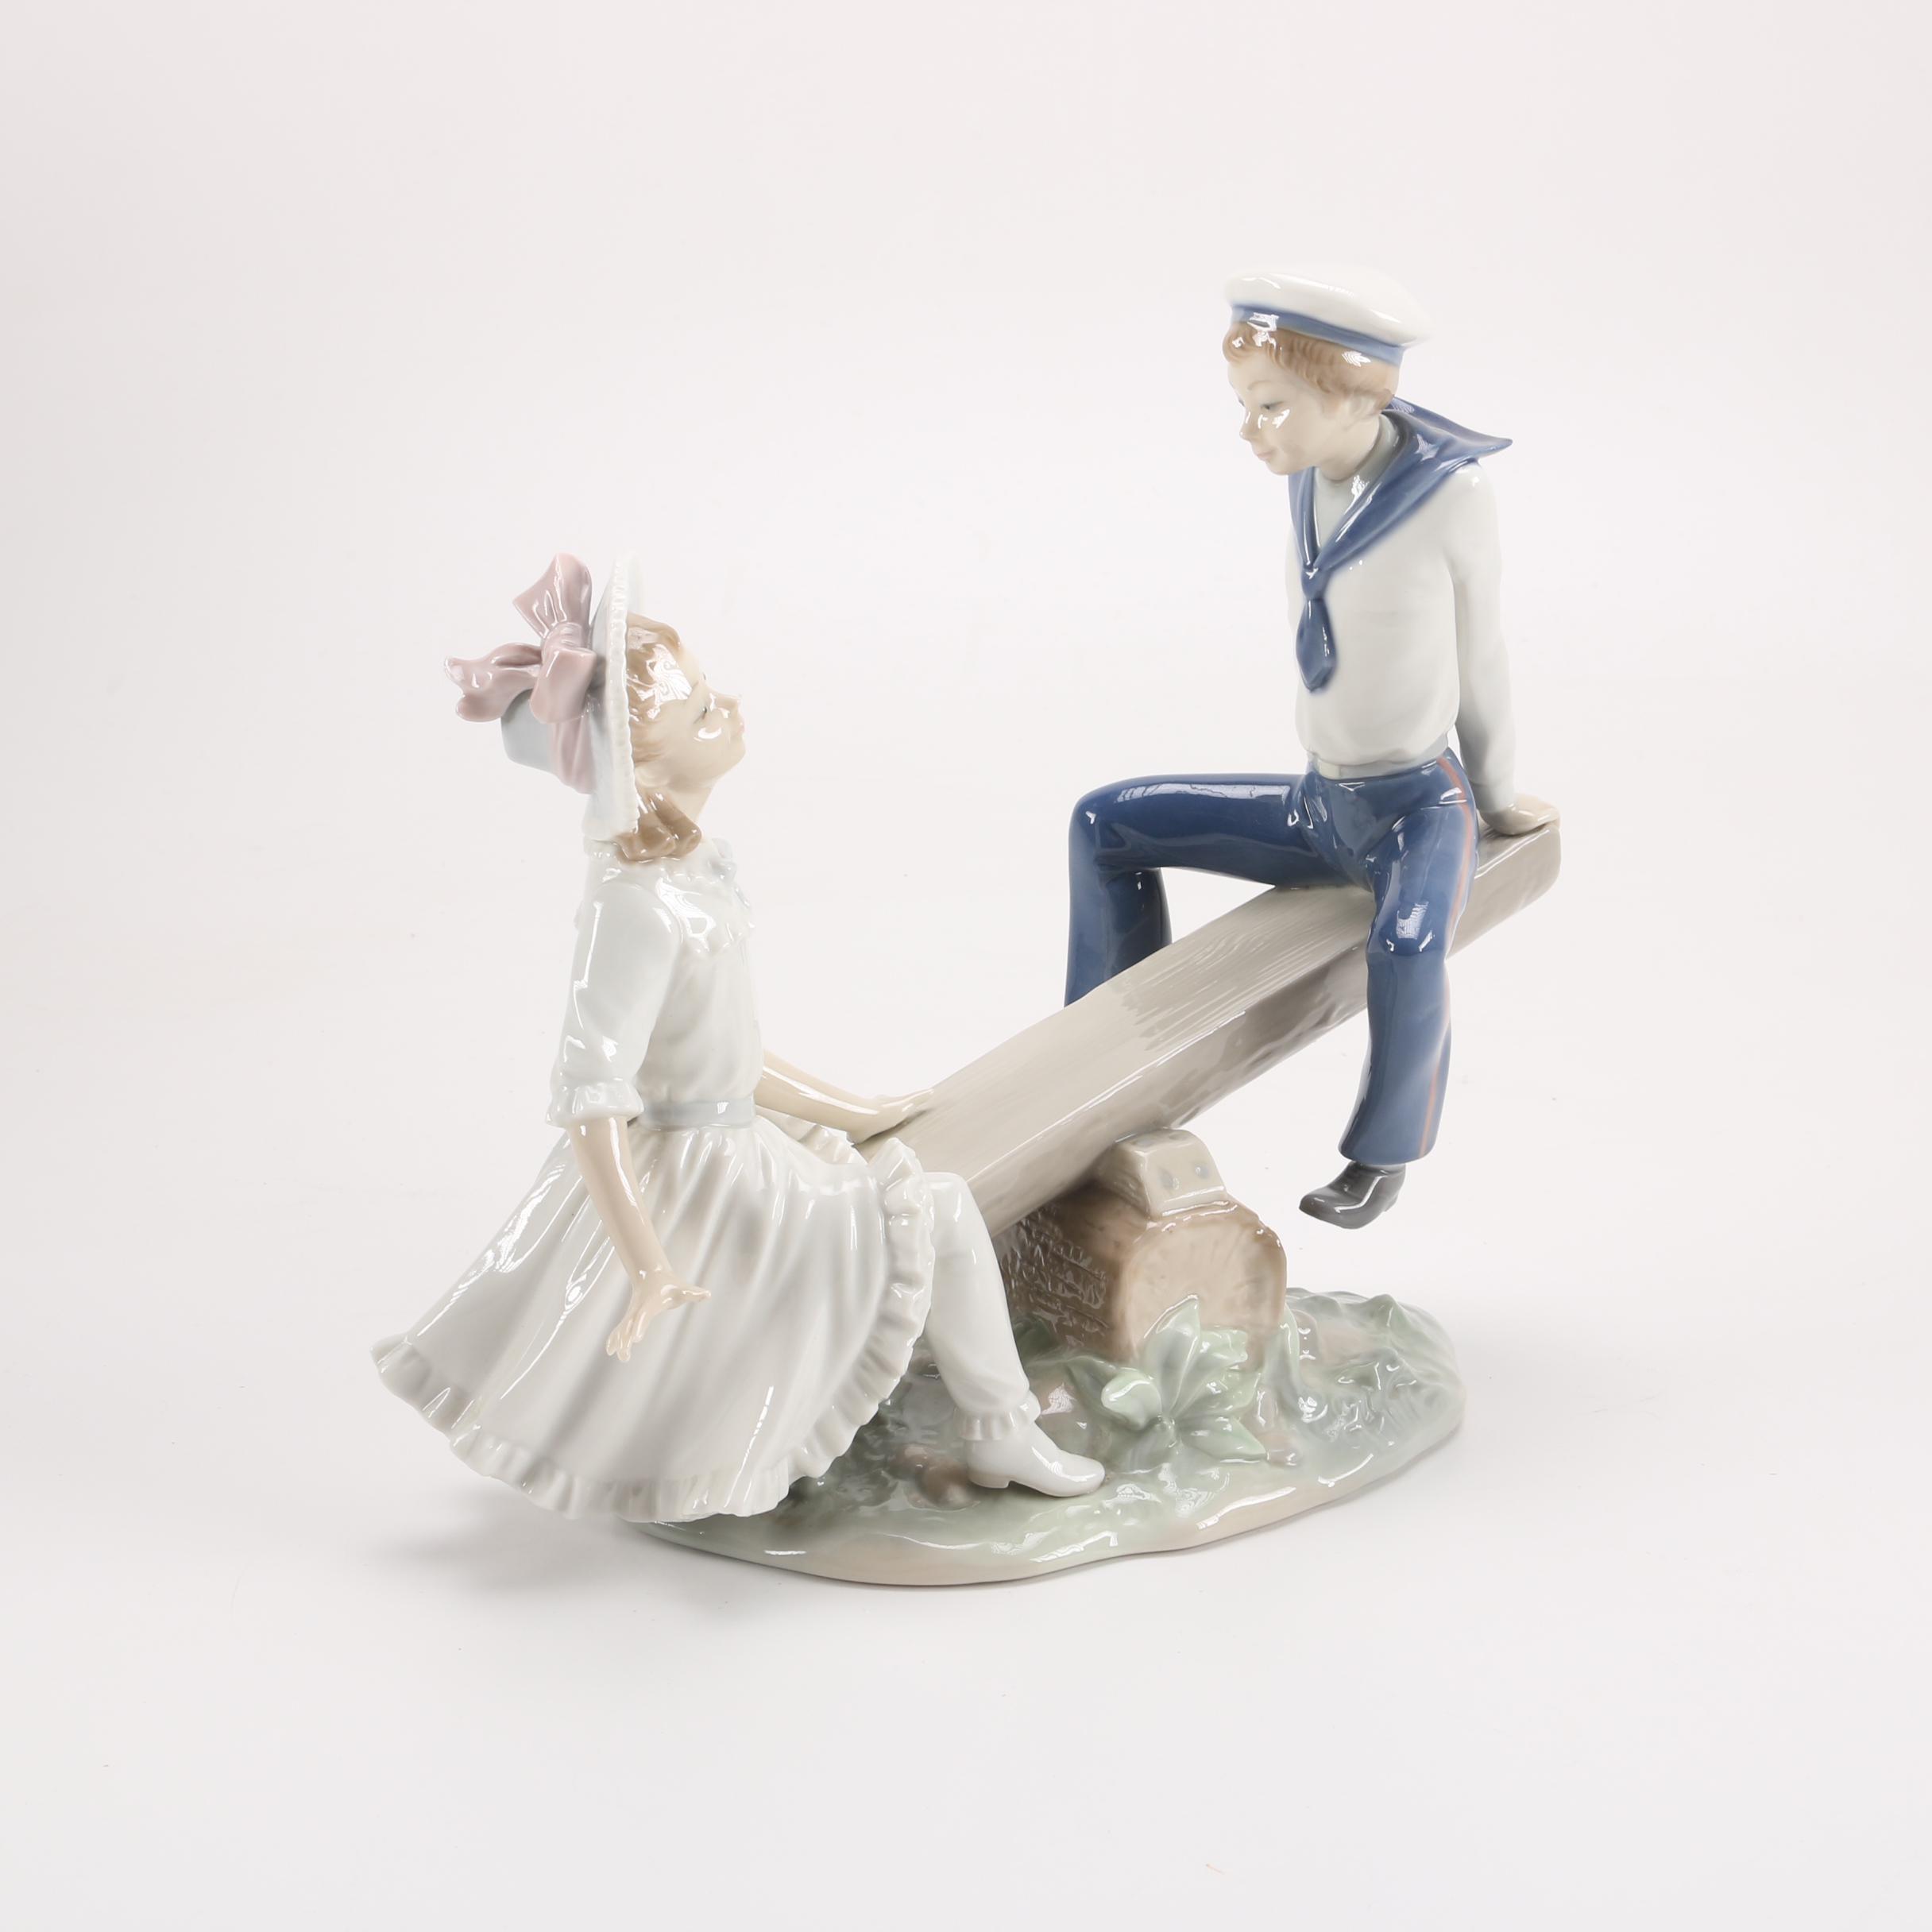 Lladró Seesaw Figurine